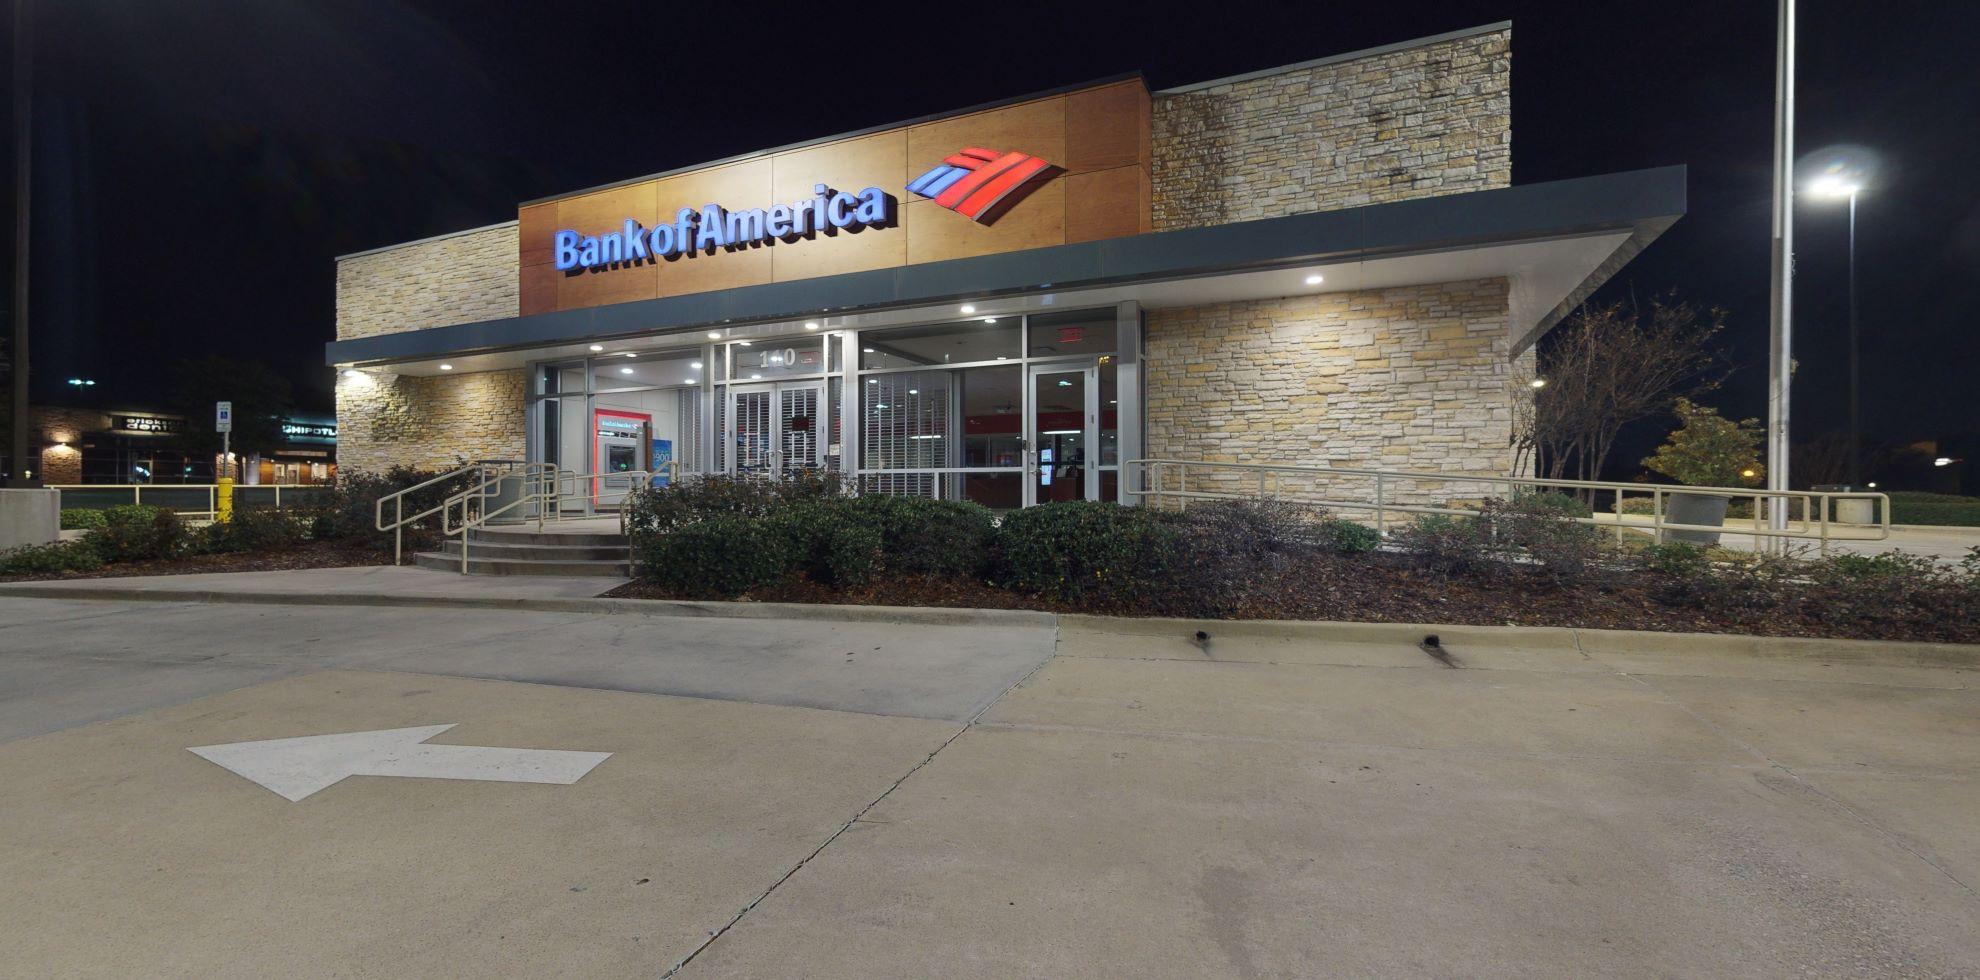 Bank of America financial center with drive-thru ATM   110 E John Carpenter Fwy, Irving, TX 75062